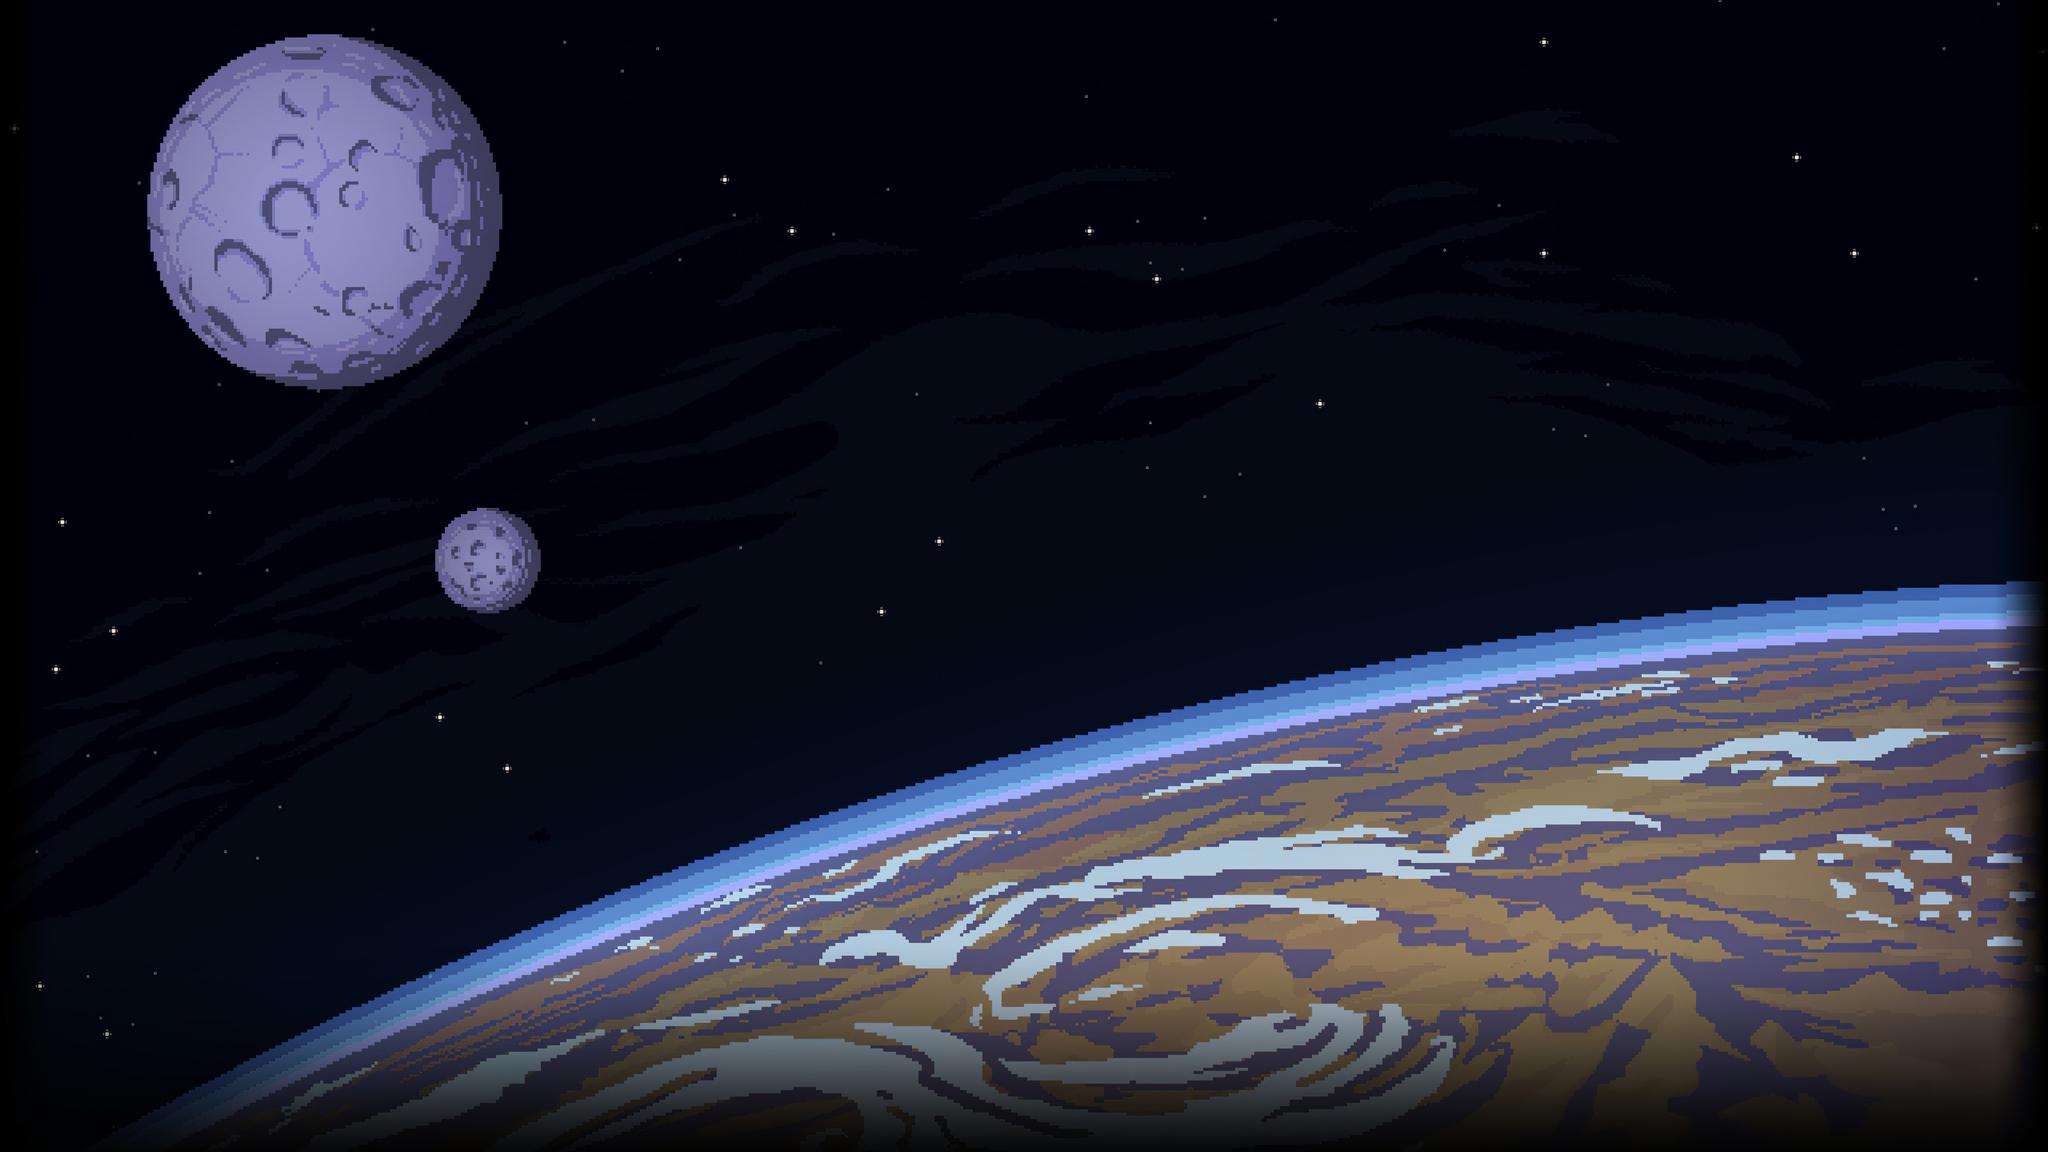 planet-pixel-art-4k-3p.jpg